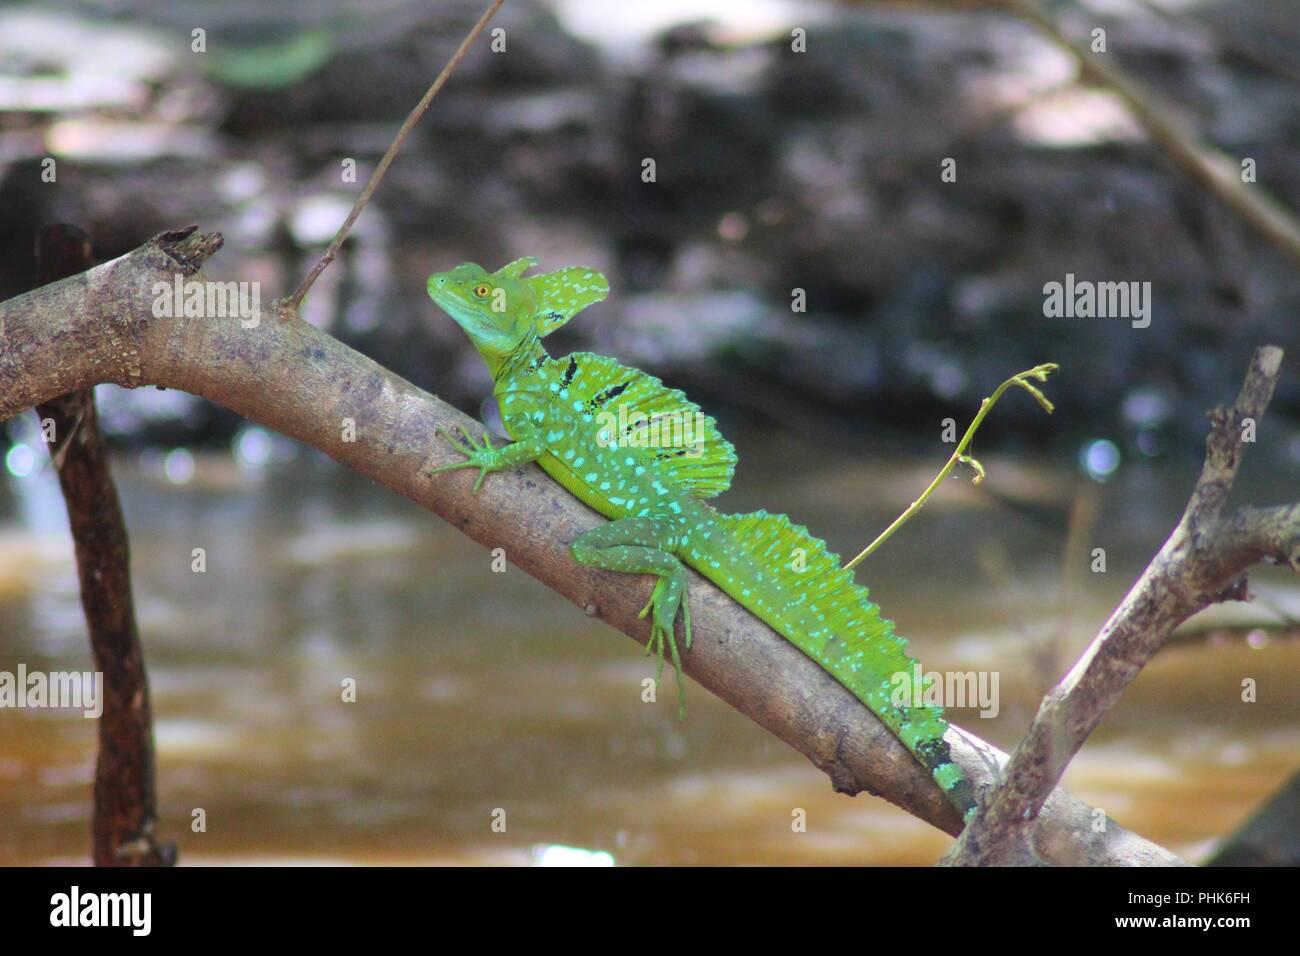 Jezus Christ Lizard or Plumed Basilisk - Costa Rica Stock Photo